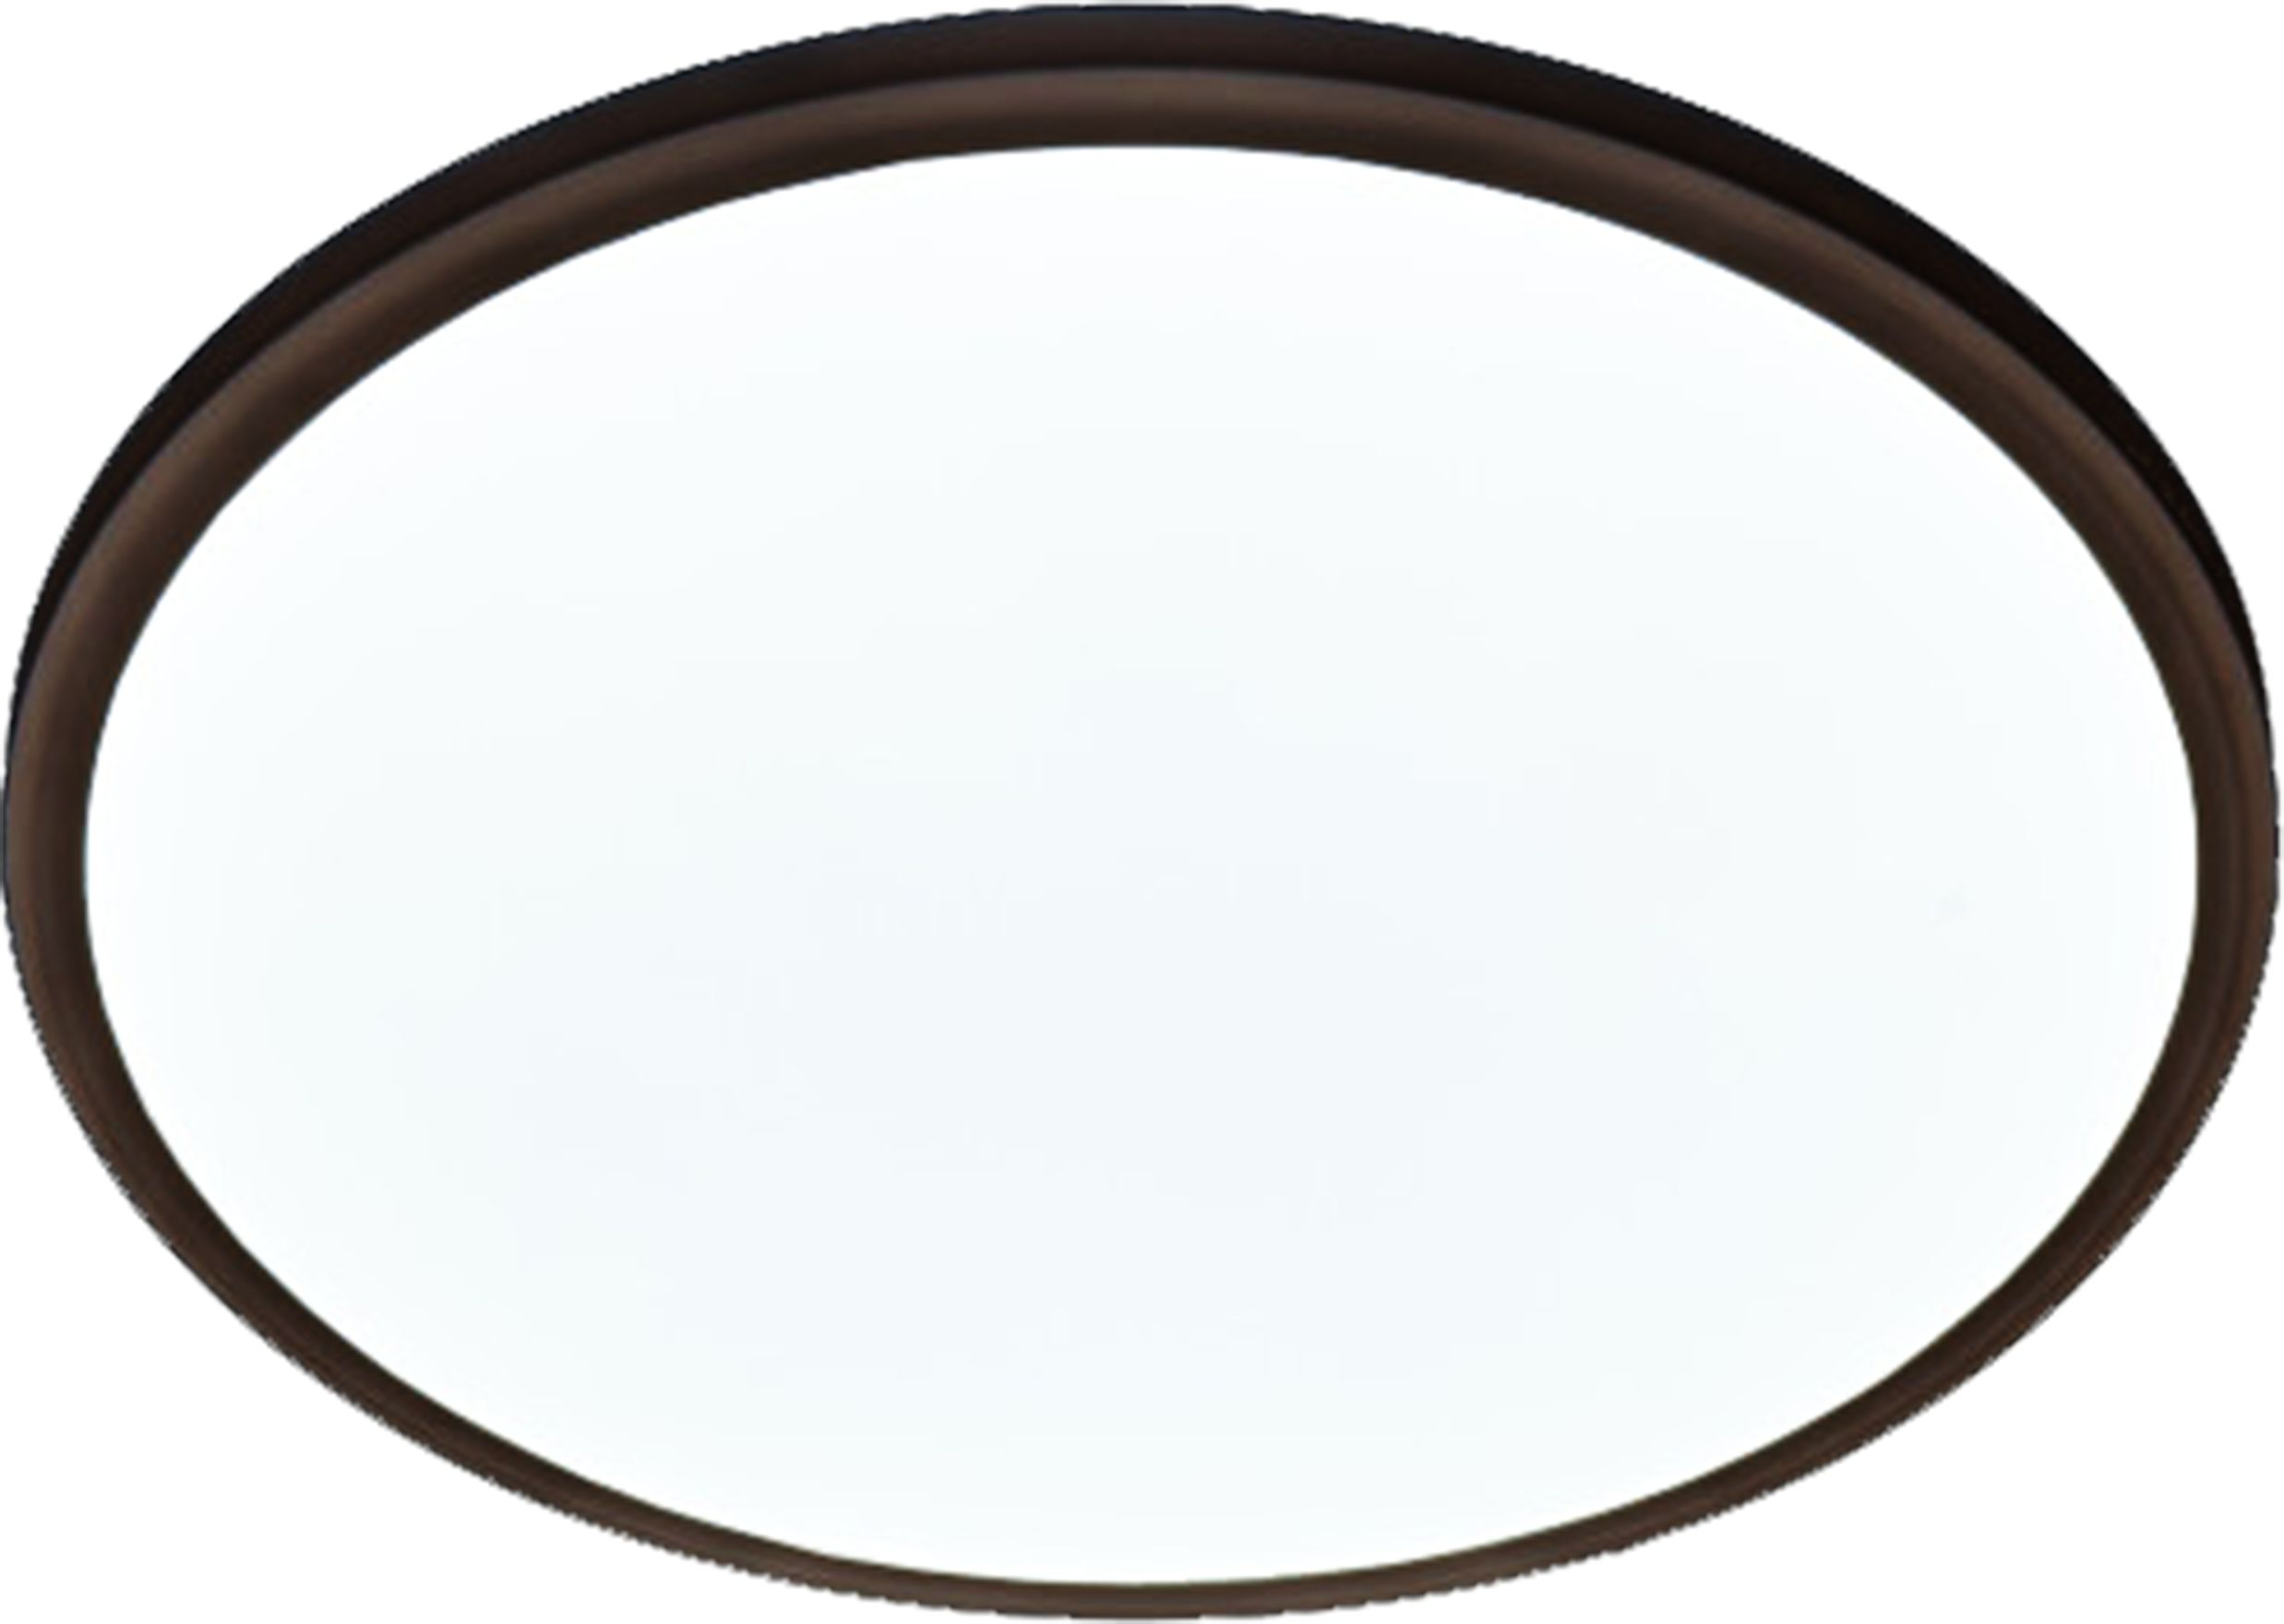 Light Prestige Arctic LP-2511/1C-32 BK plafon lampa sufitowa czarny 4000K 1x24W LED IP54 32cm